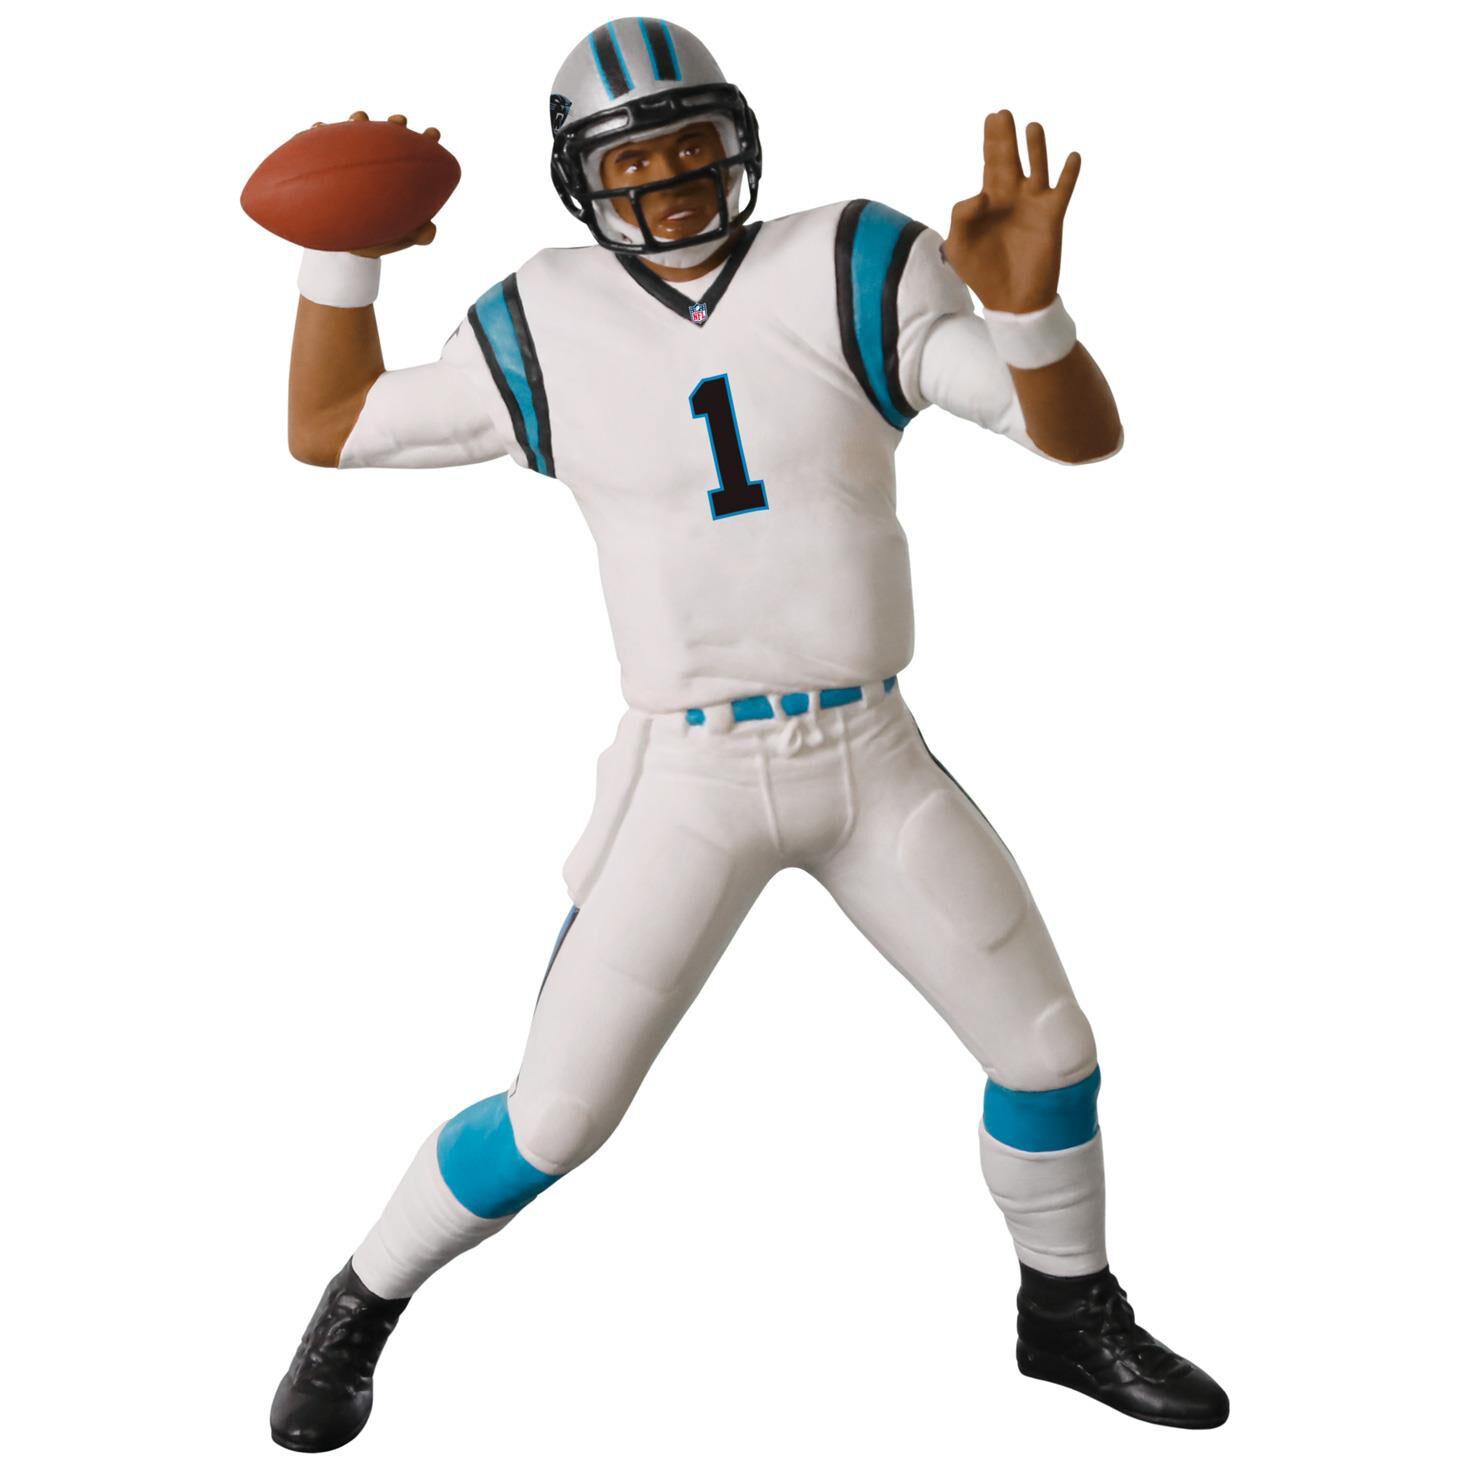 Football player ornament - Football Legends Carolina Panthers Cam Newton Ornament Keepsake Ornaments Hallmark